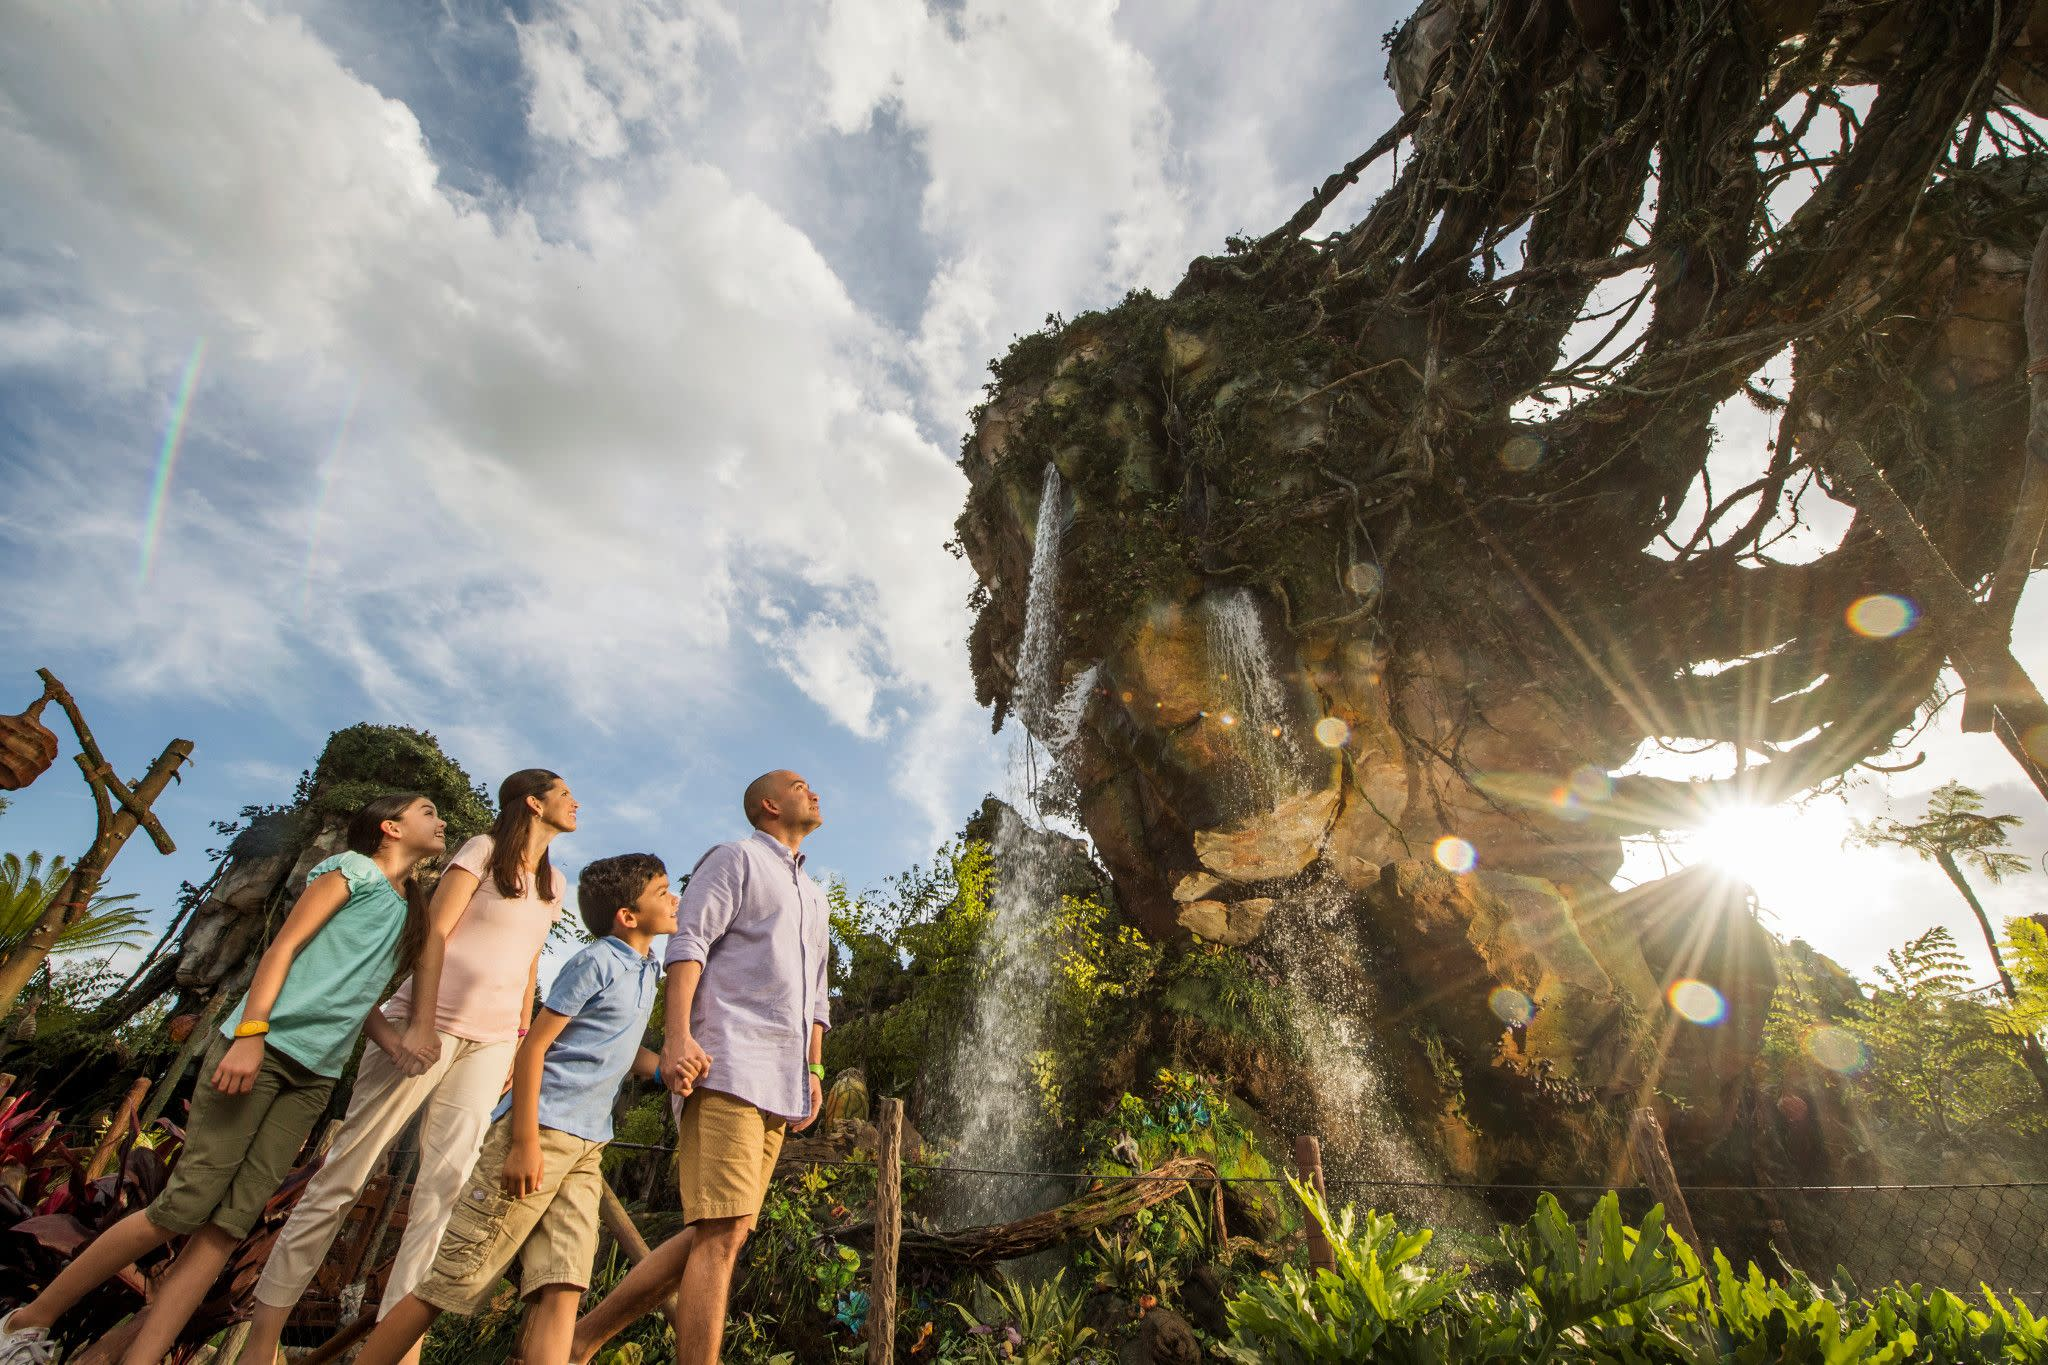 Pandora — The World of Avatar at Disney's Animal Kingdom Theme Park in Orlando